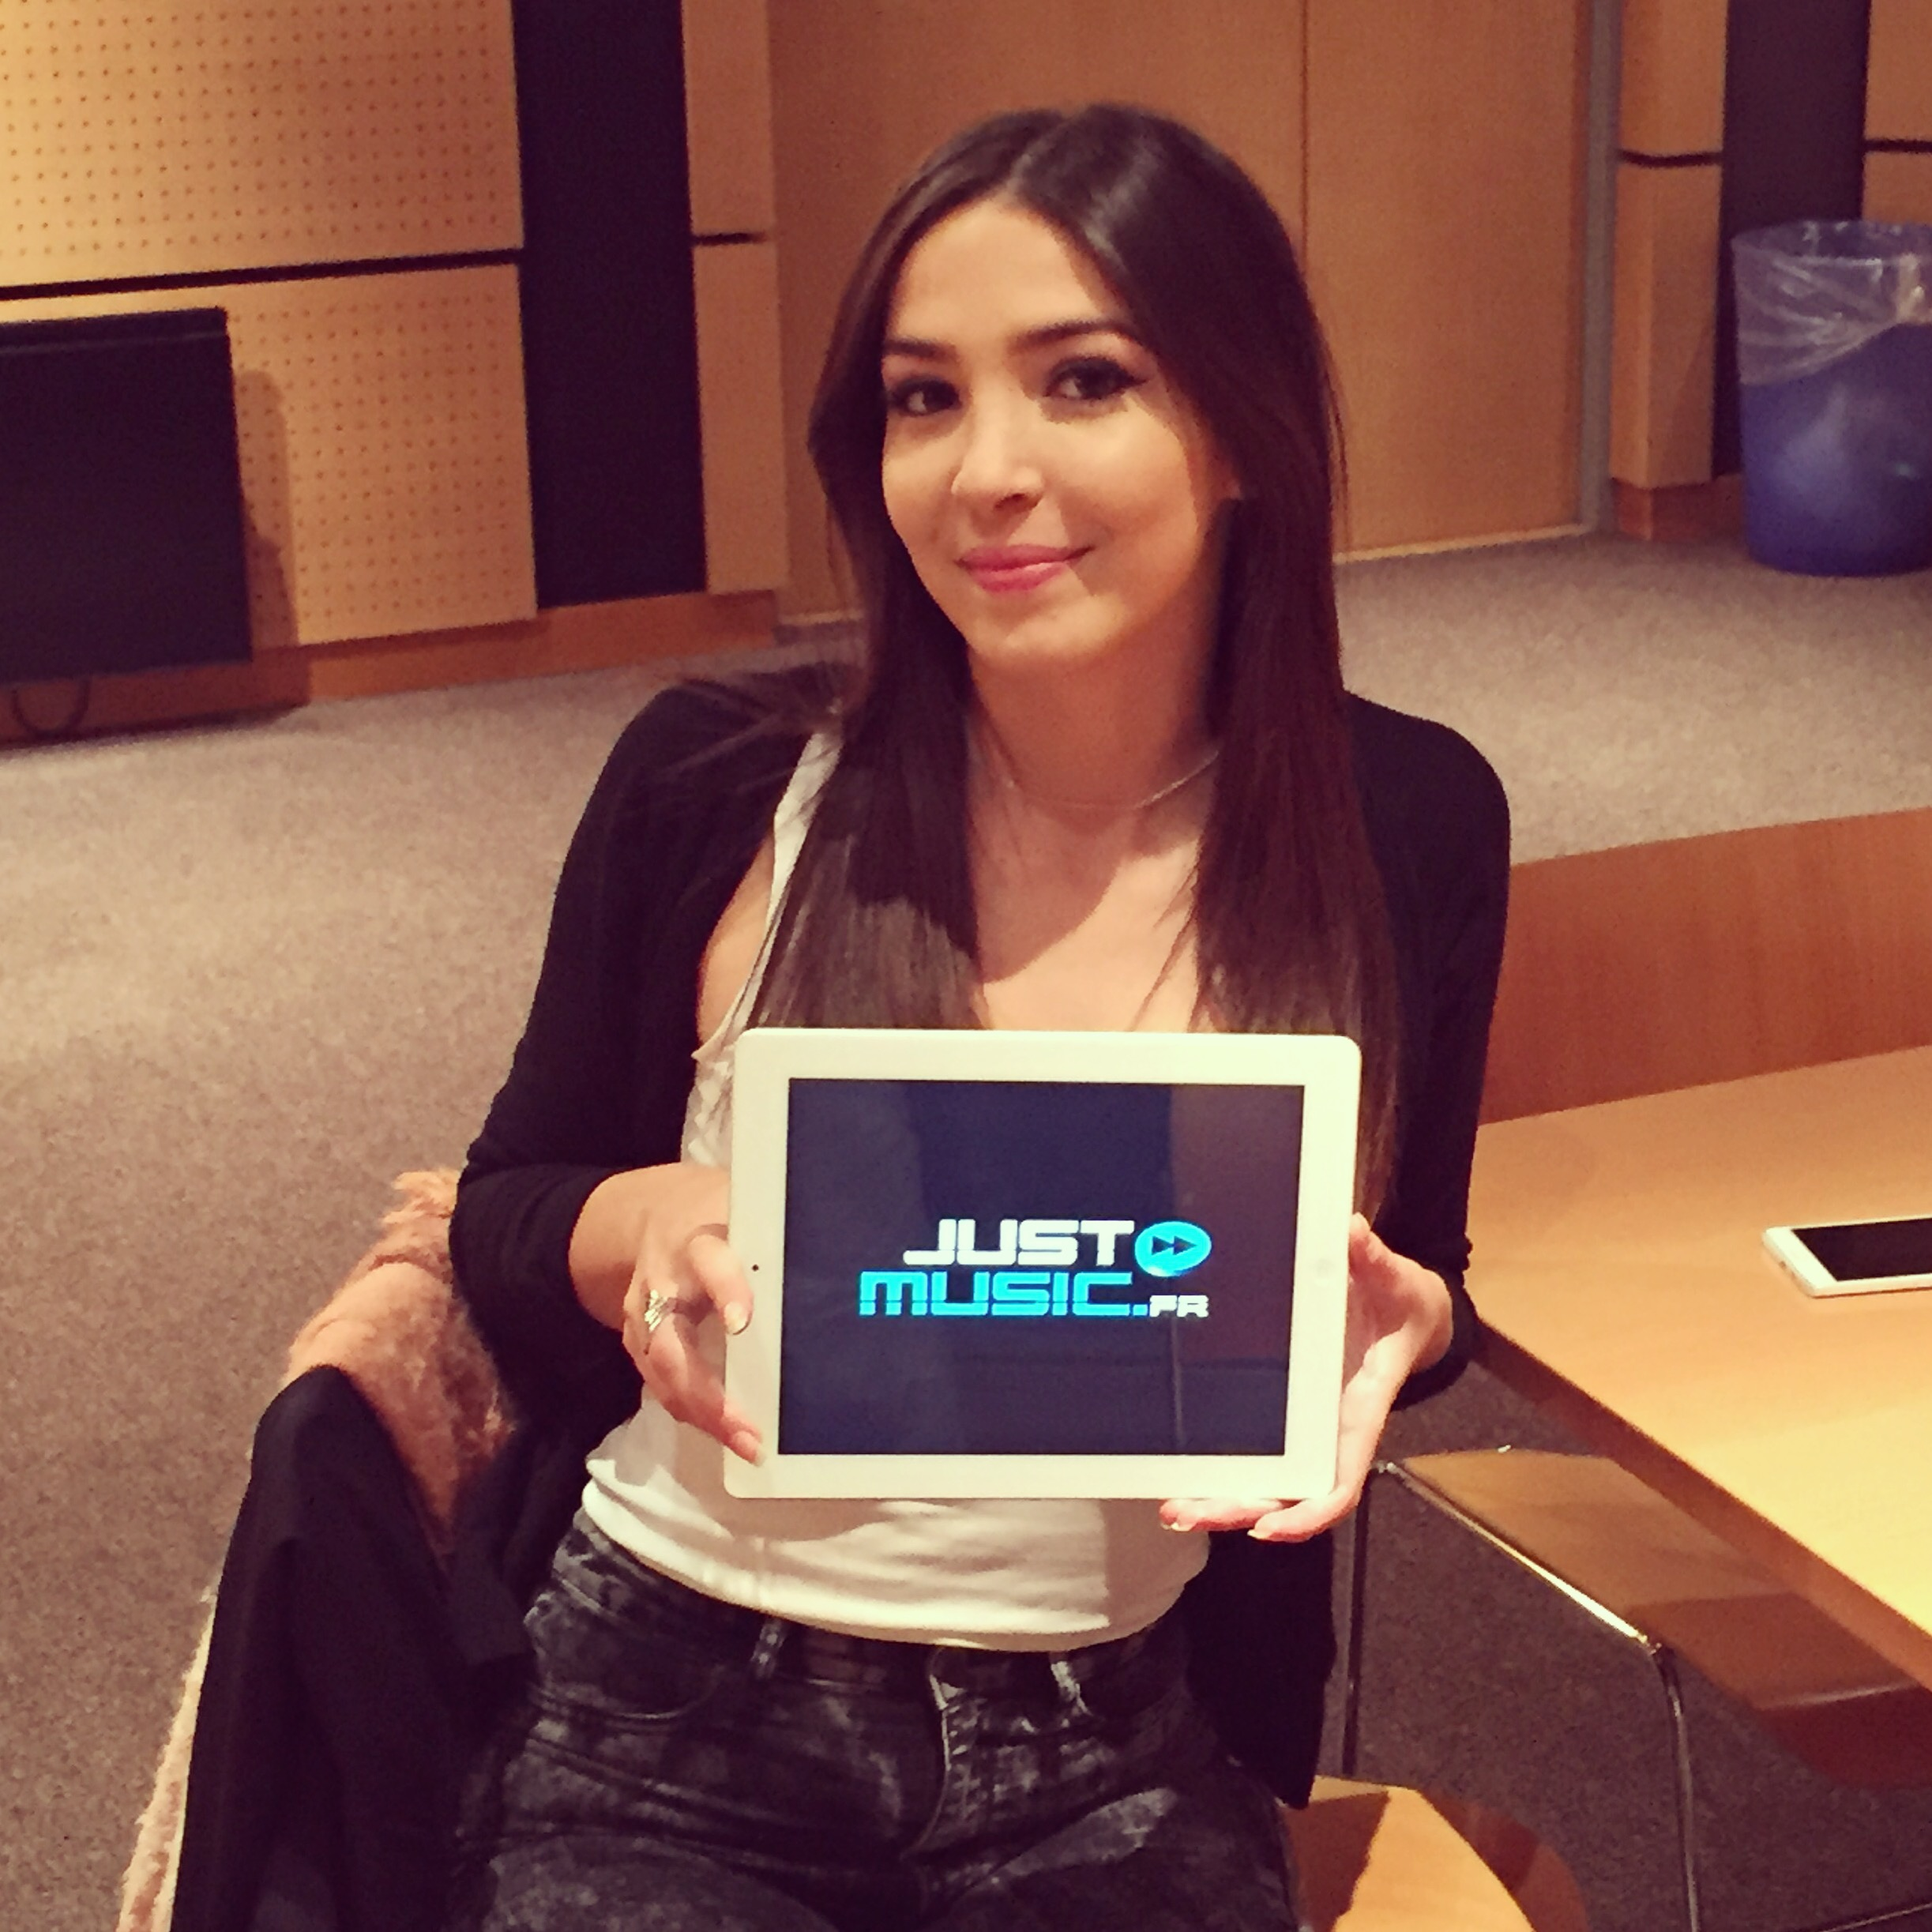 Ally Hana JustMusic.fr Interview